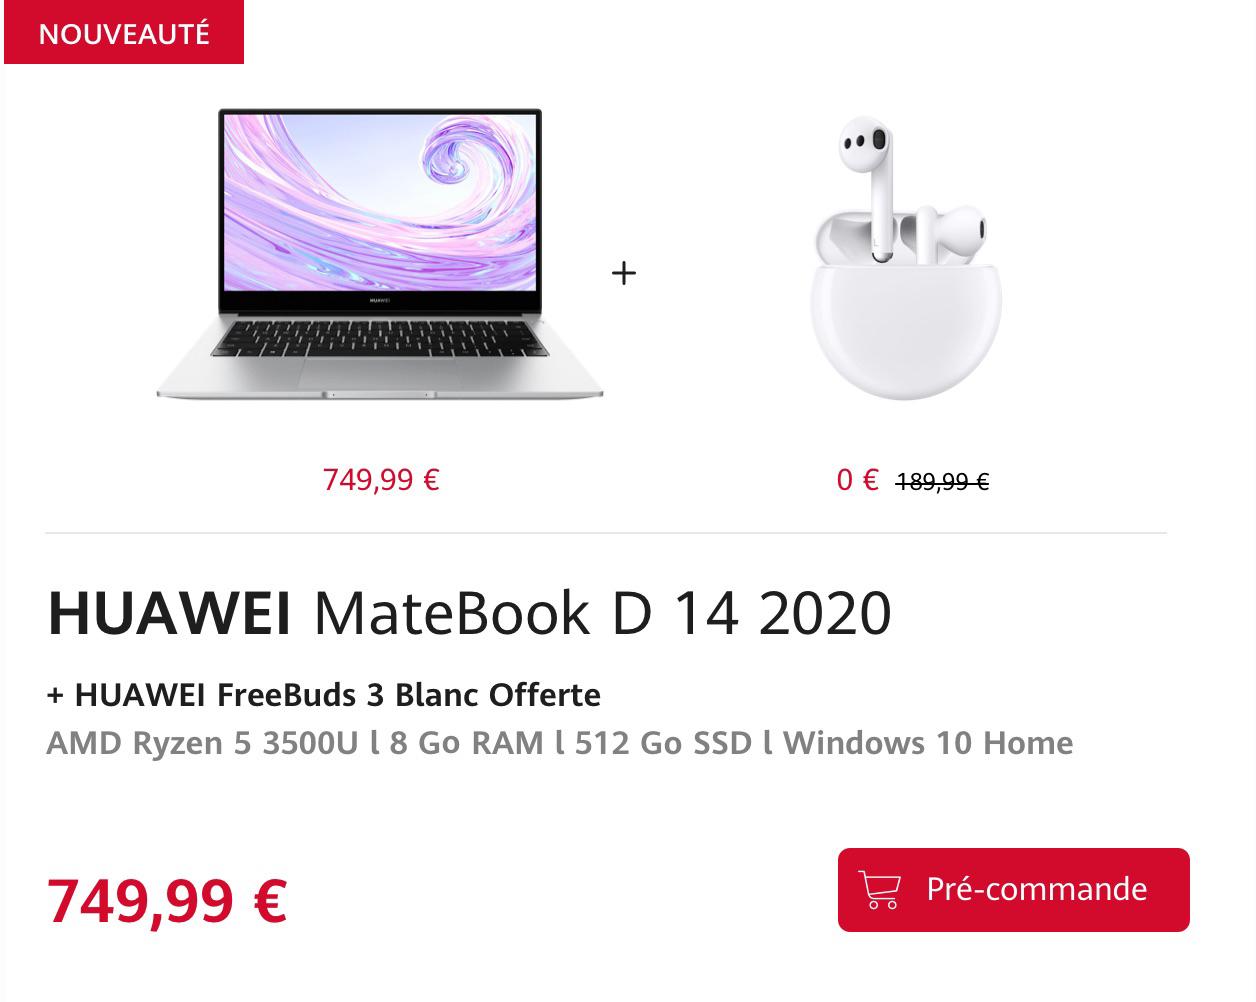 "[Précommande] PC Portable 14"" Matebook D 14 2020 - Full HD, Ryzen, 8 Go de RAM, SSD 512Go, Windows 10"